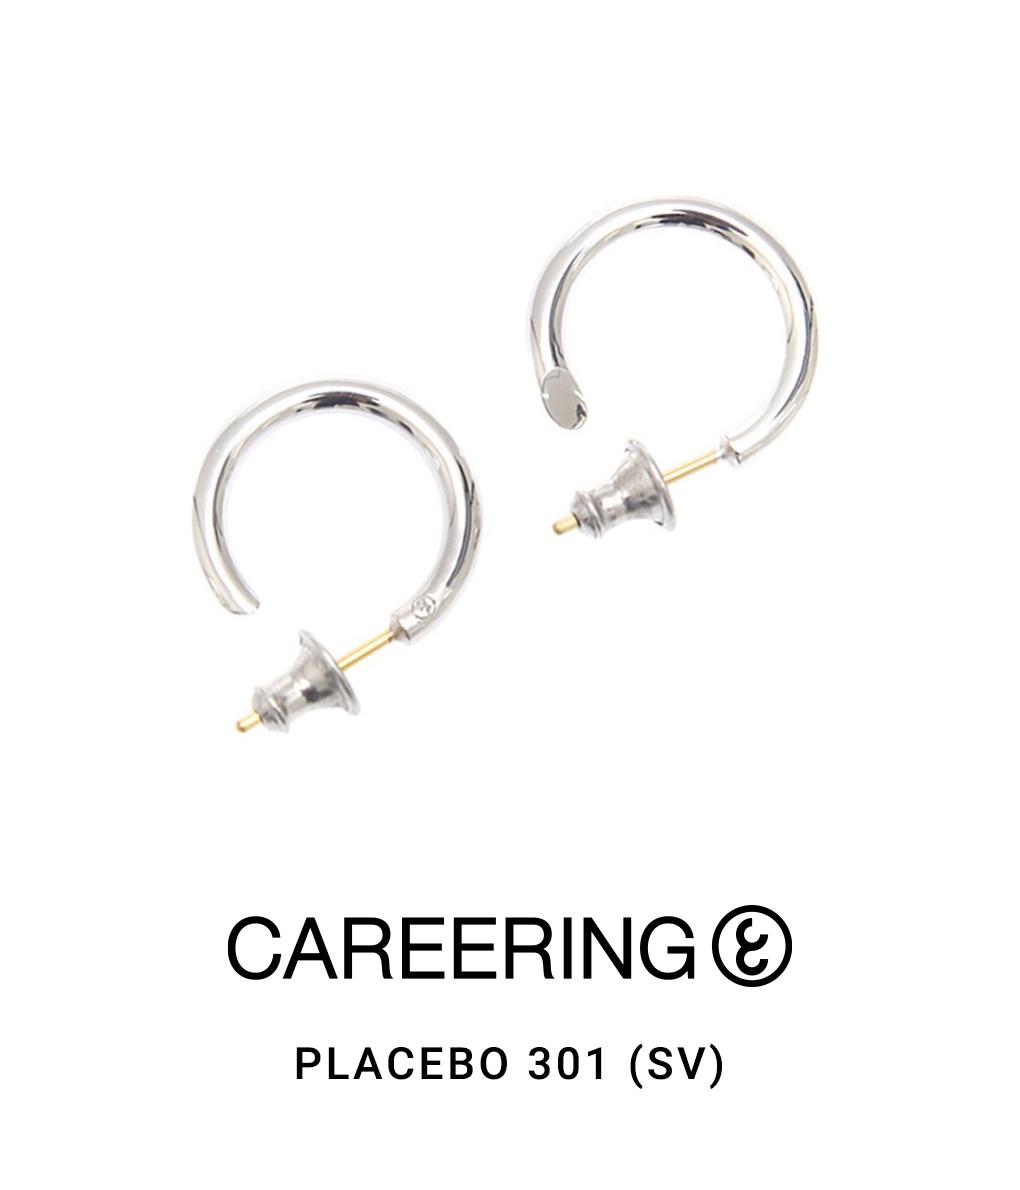 CAREERING / キャリアリング : PLACEBO 301 (SV) : プラシーボ ピアス アクセサリー メンズ : PLACEBO-301-SV 【NOA】